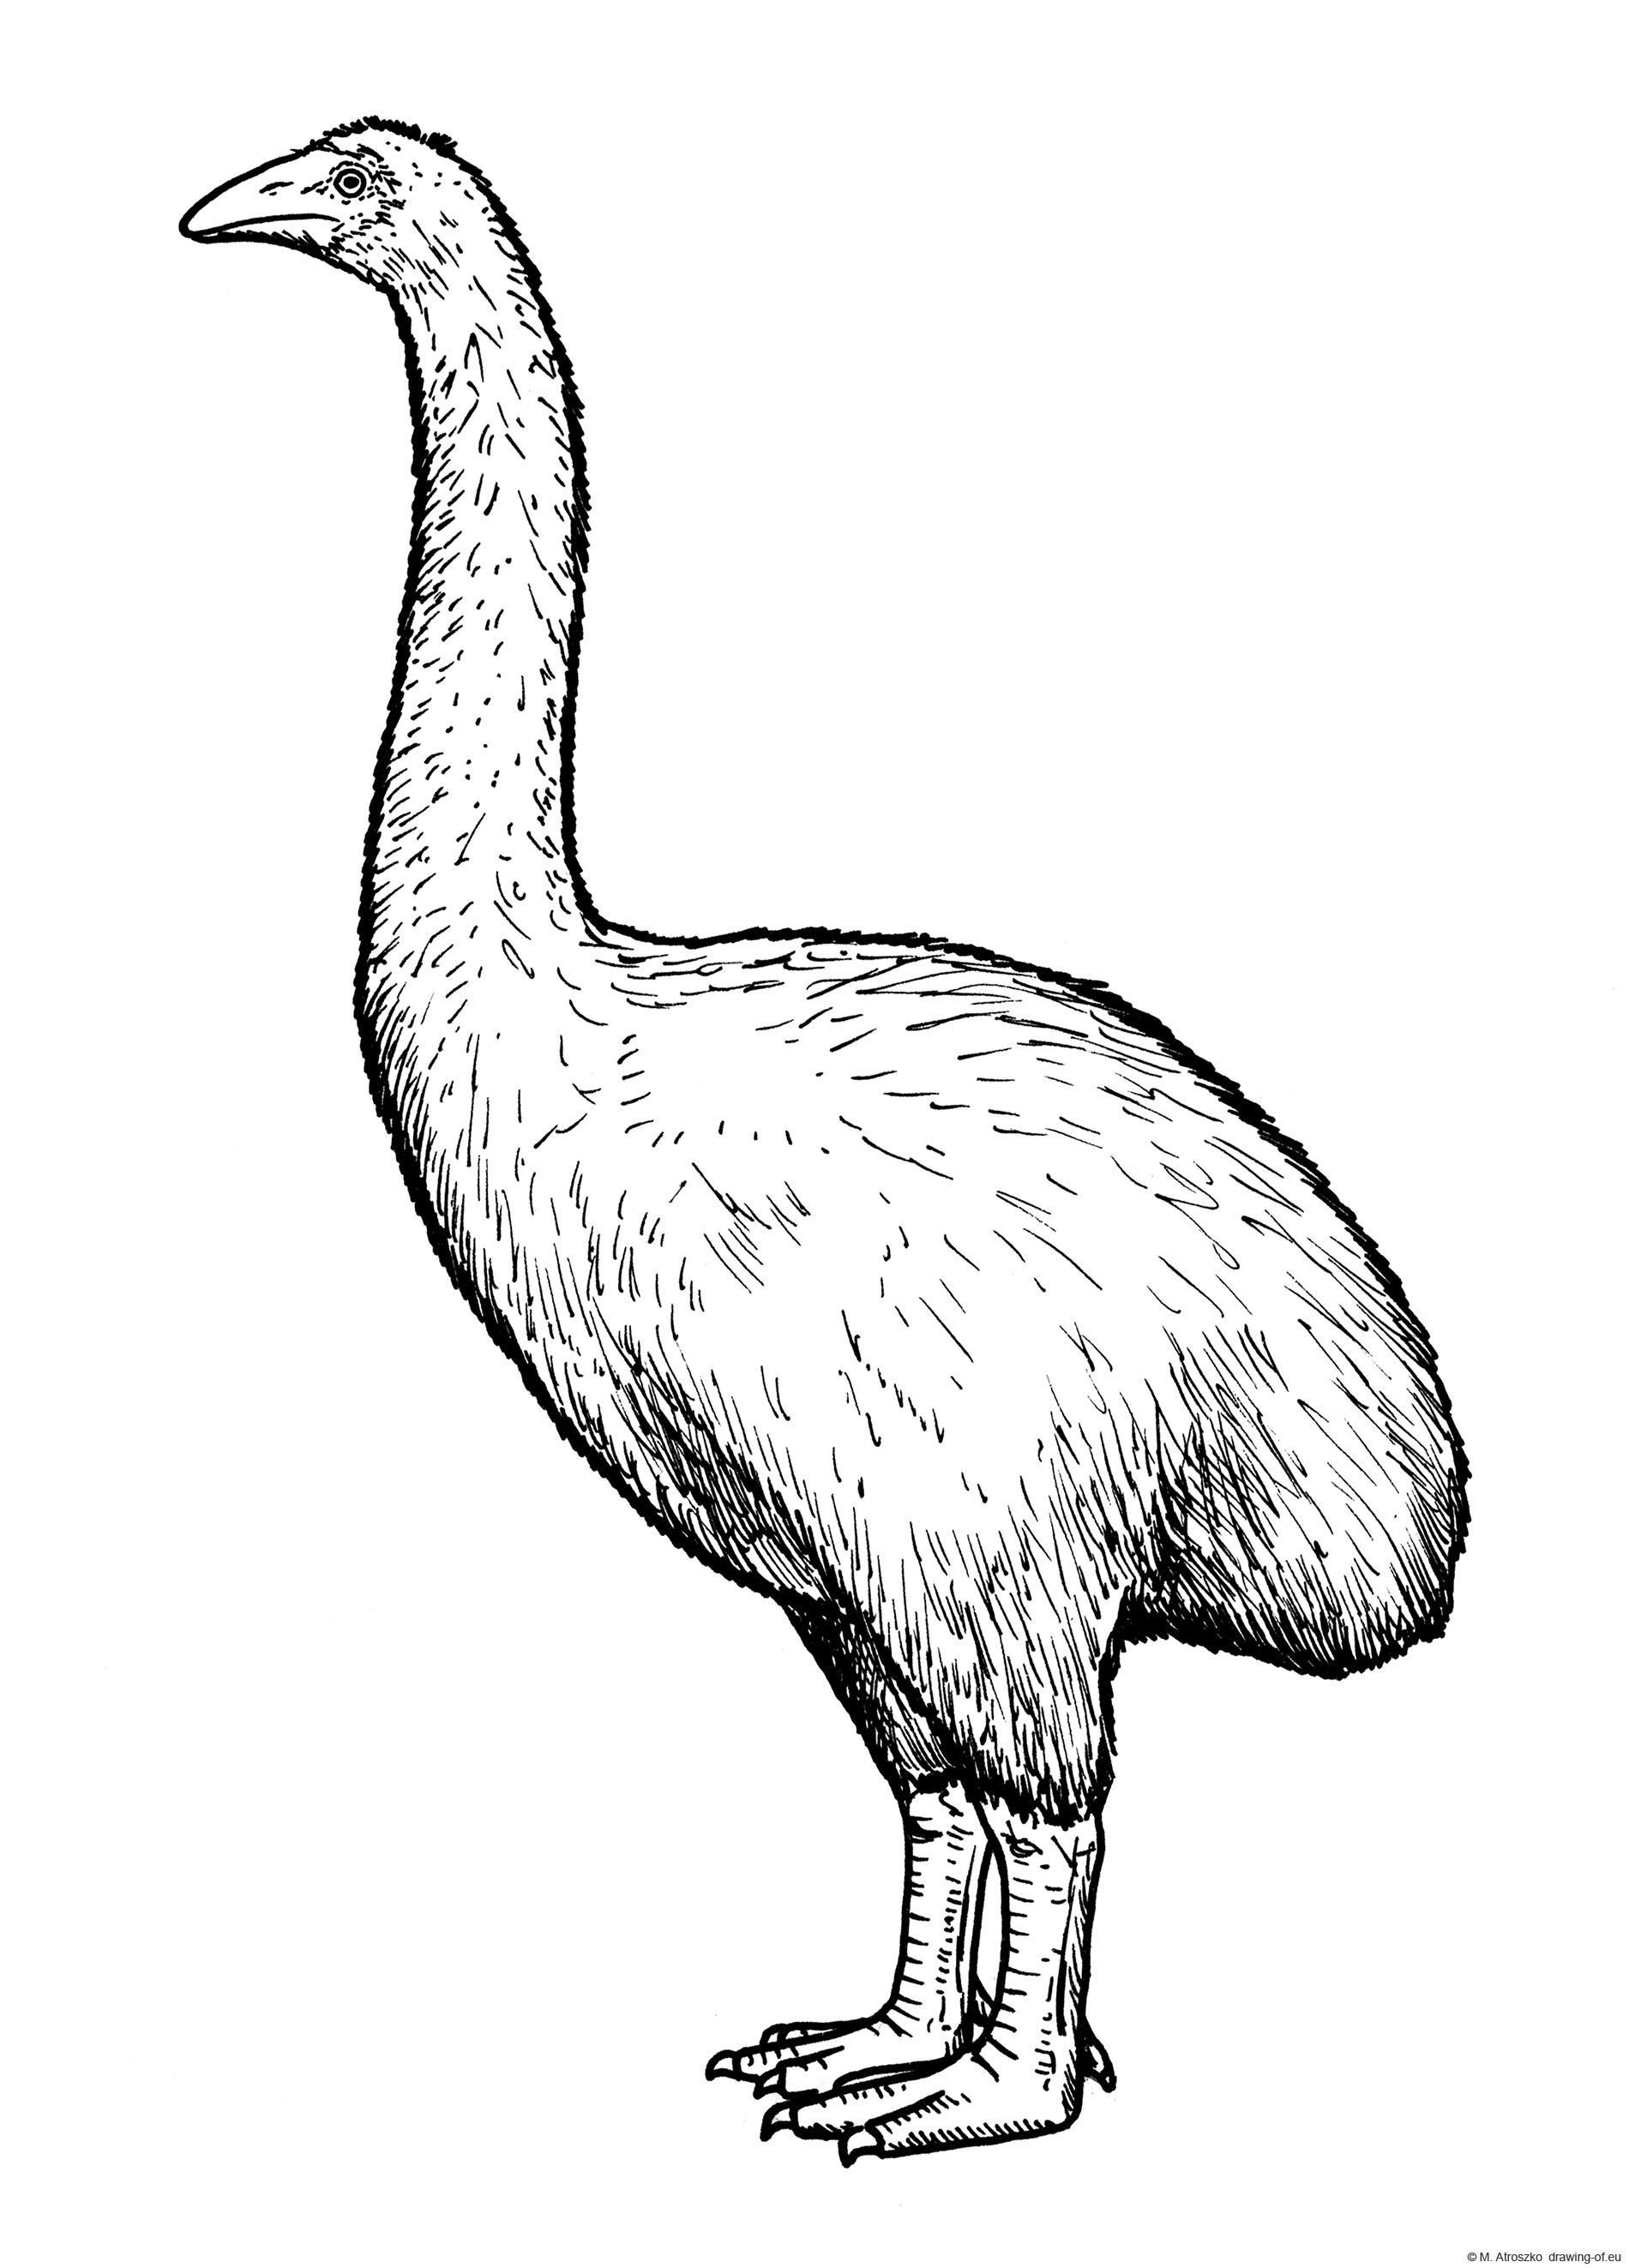 Moa bird drawing